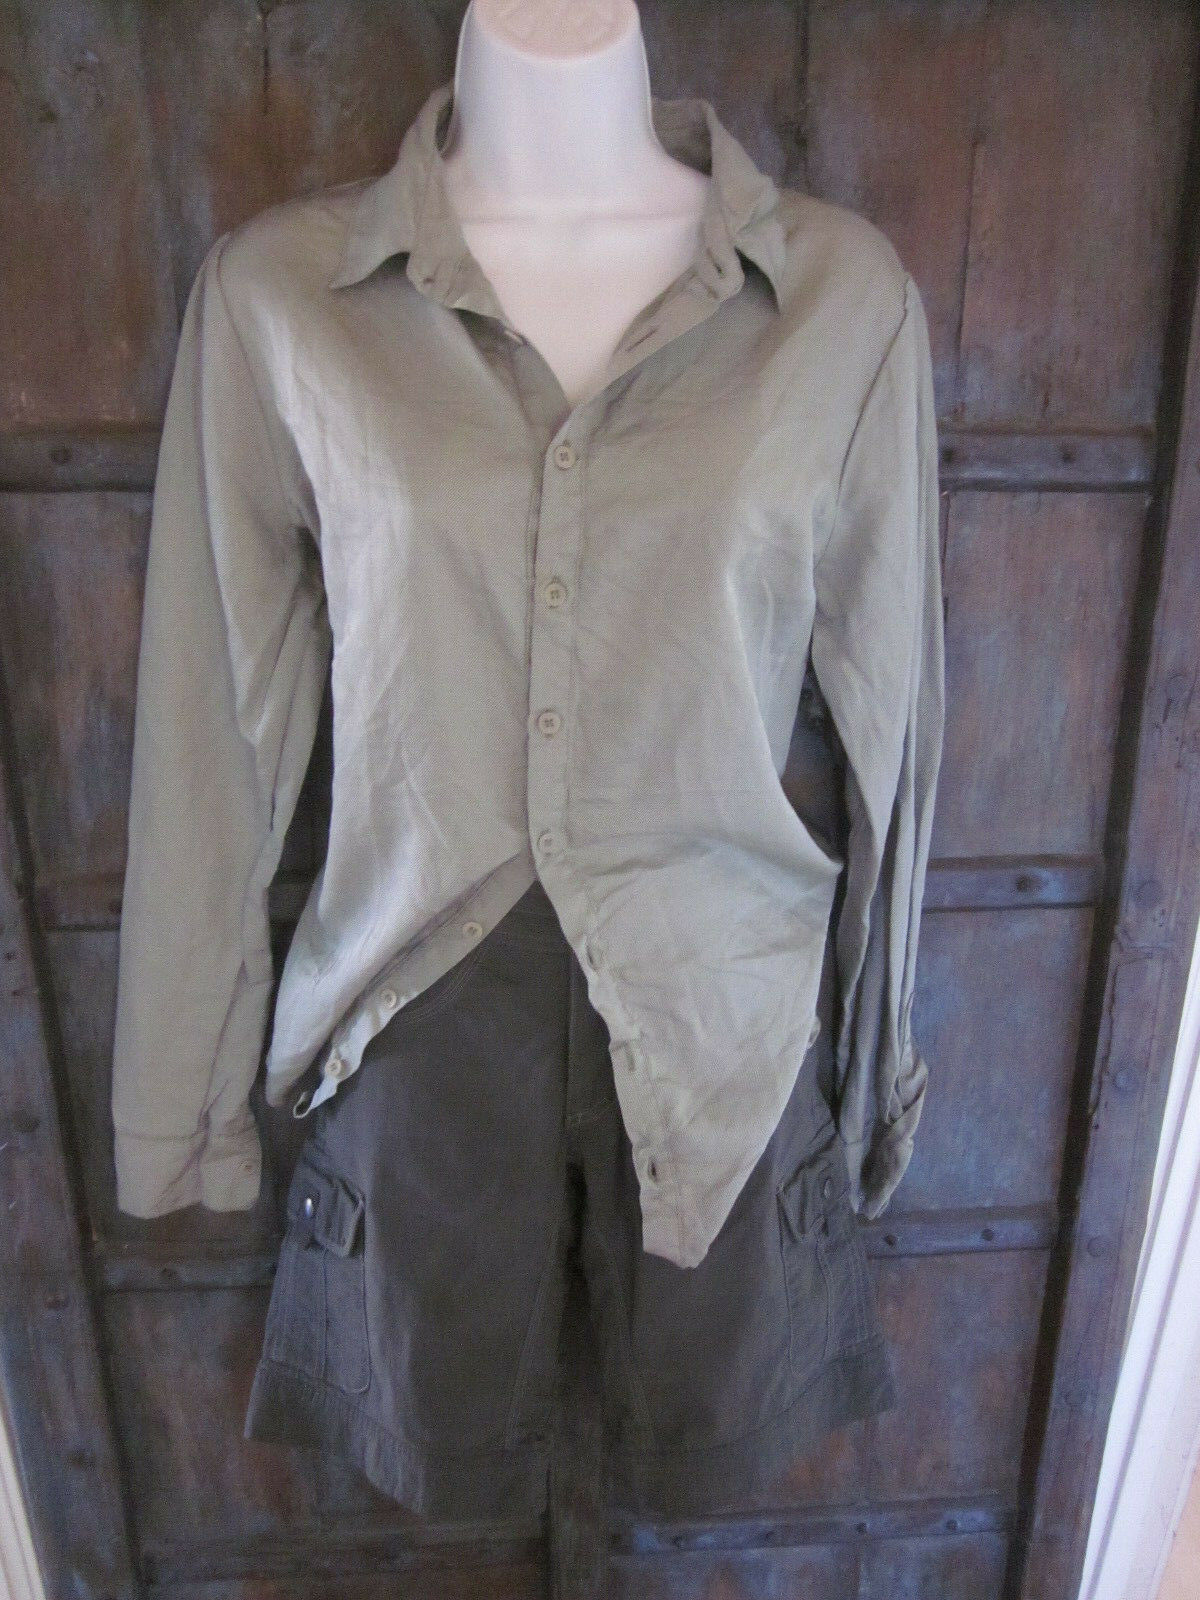 CP Shades damen Cotton Silk Long Sleeve Button Shirt Top Größe Large Sage Grün